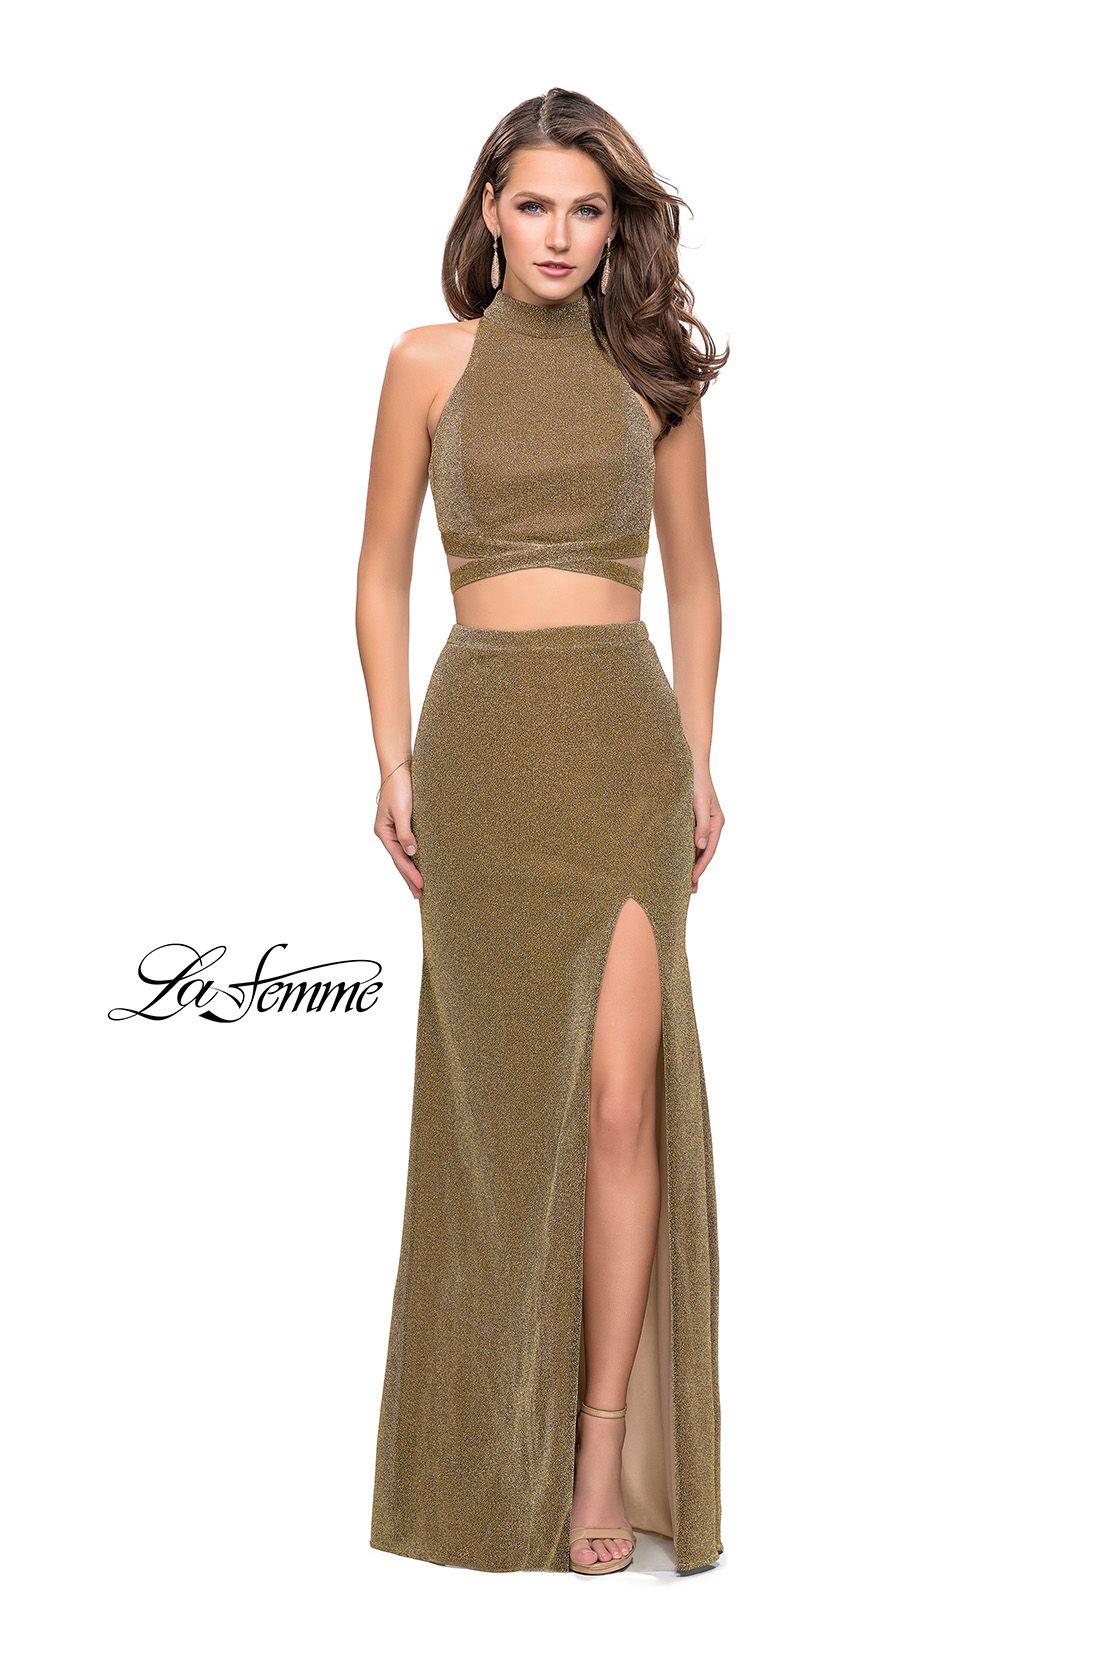 La femme international prom association dresses promdress